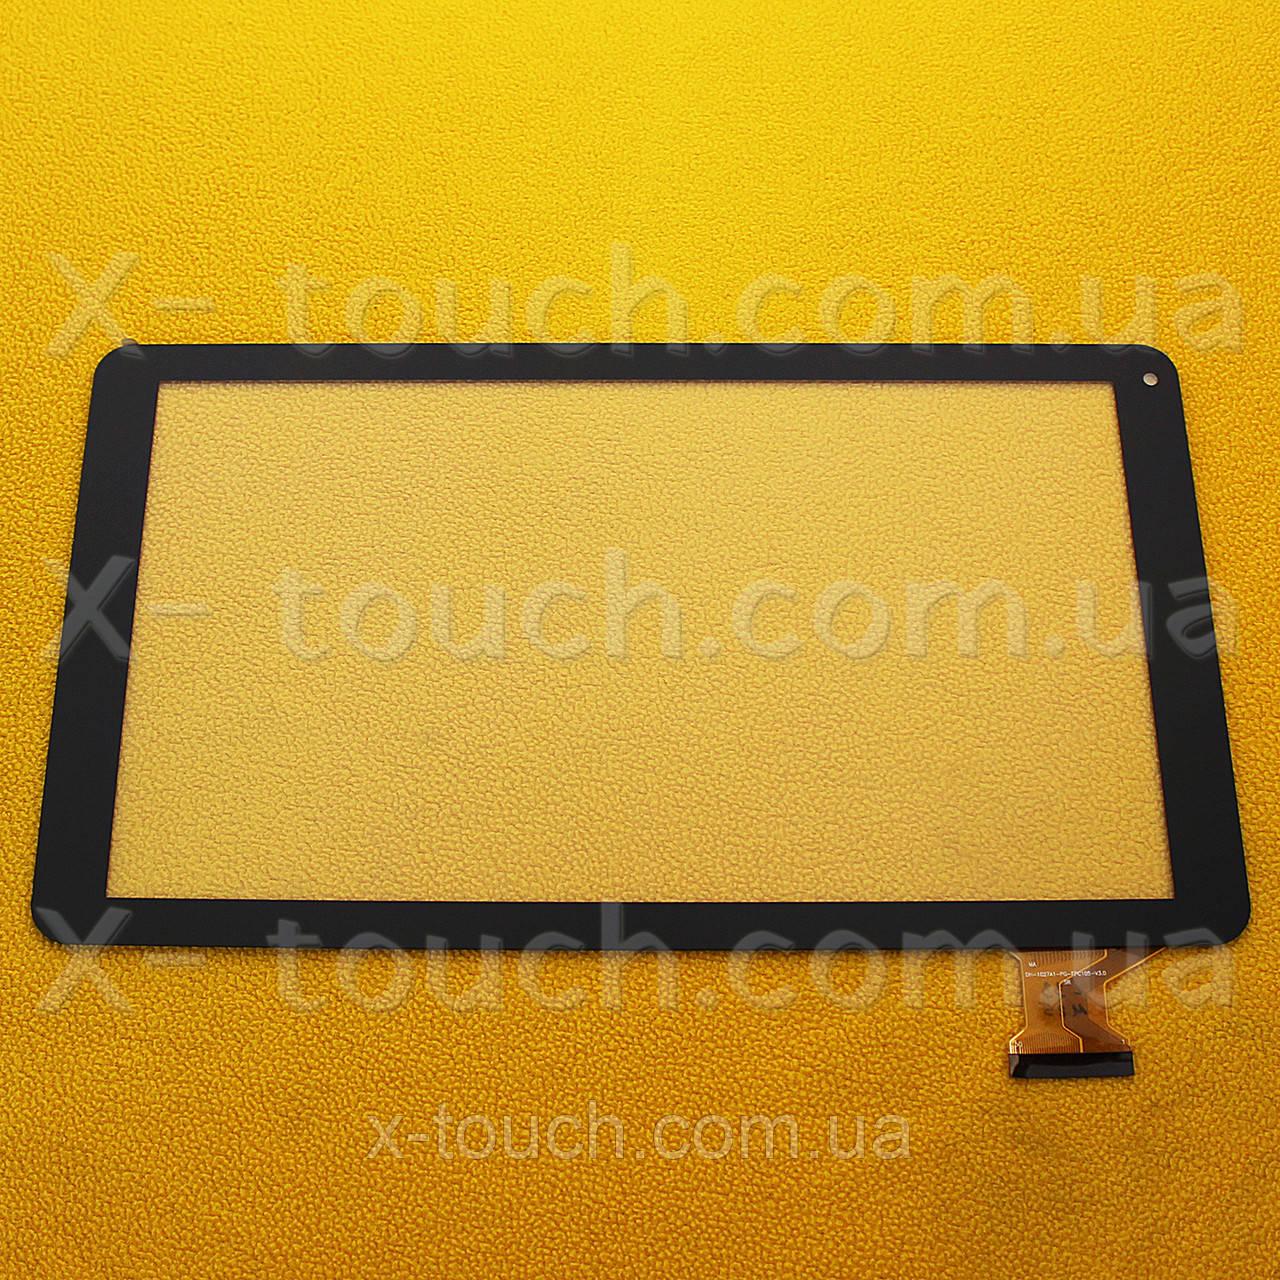 Тачскрин, сенсор Archos 101 Xenon Lite AC101XEL для планшета